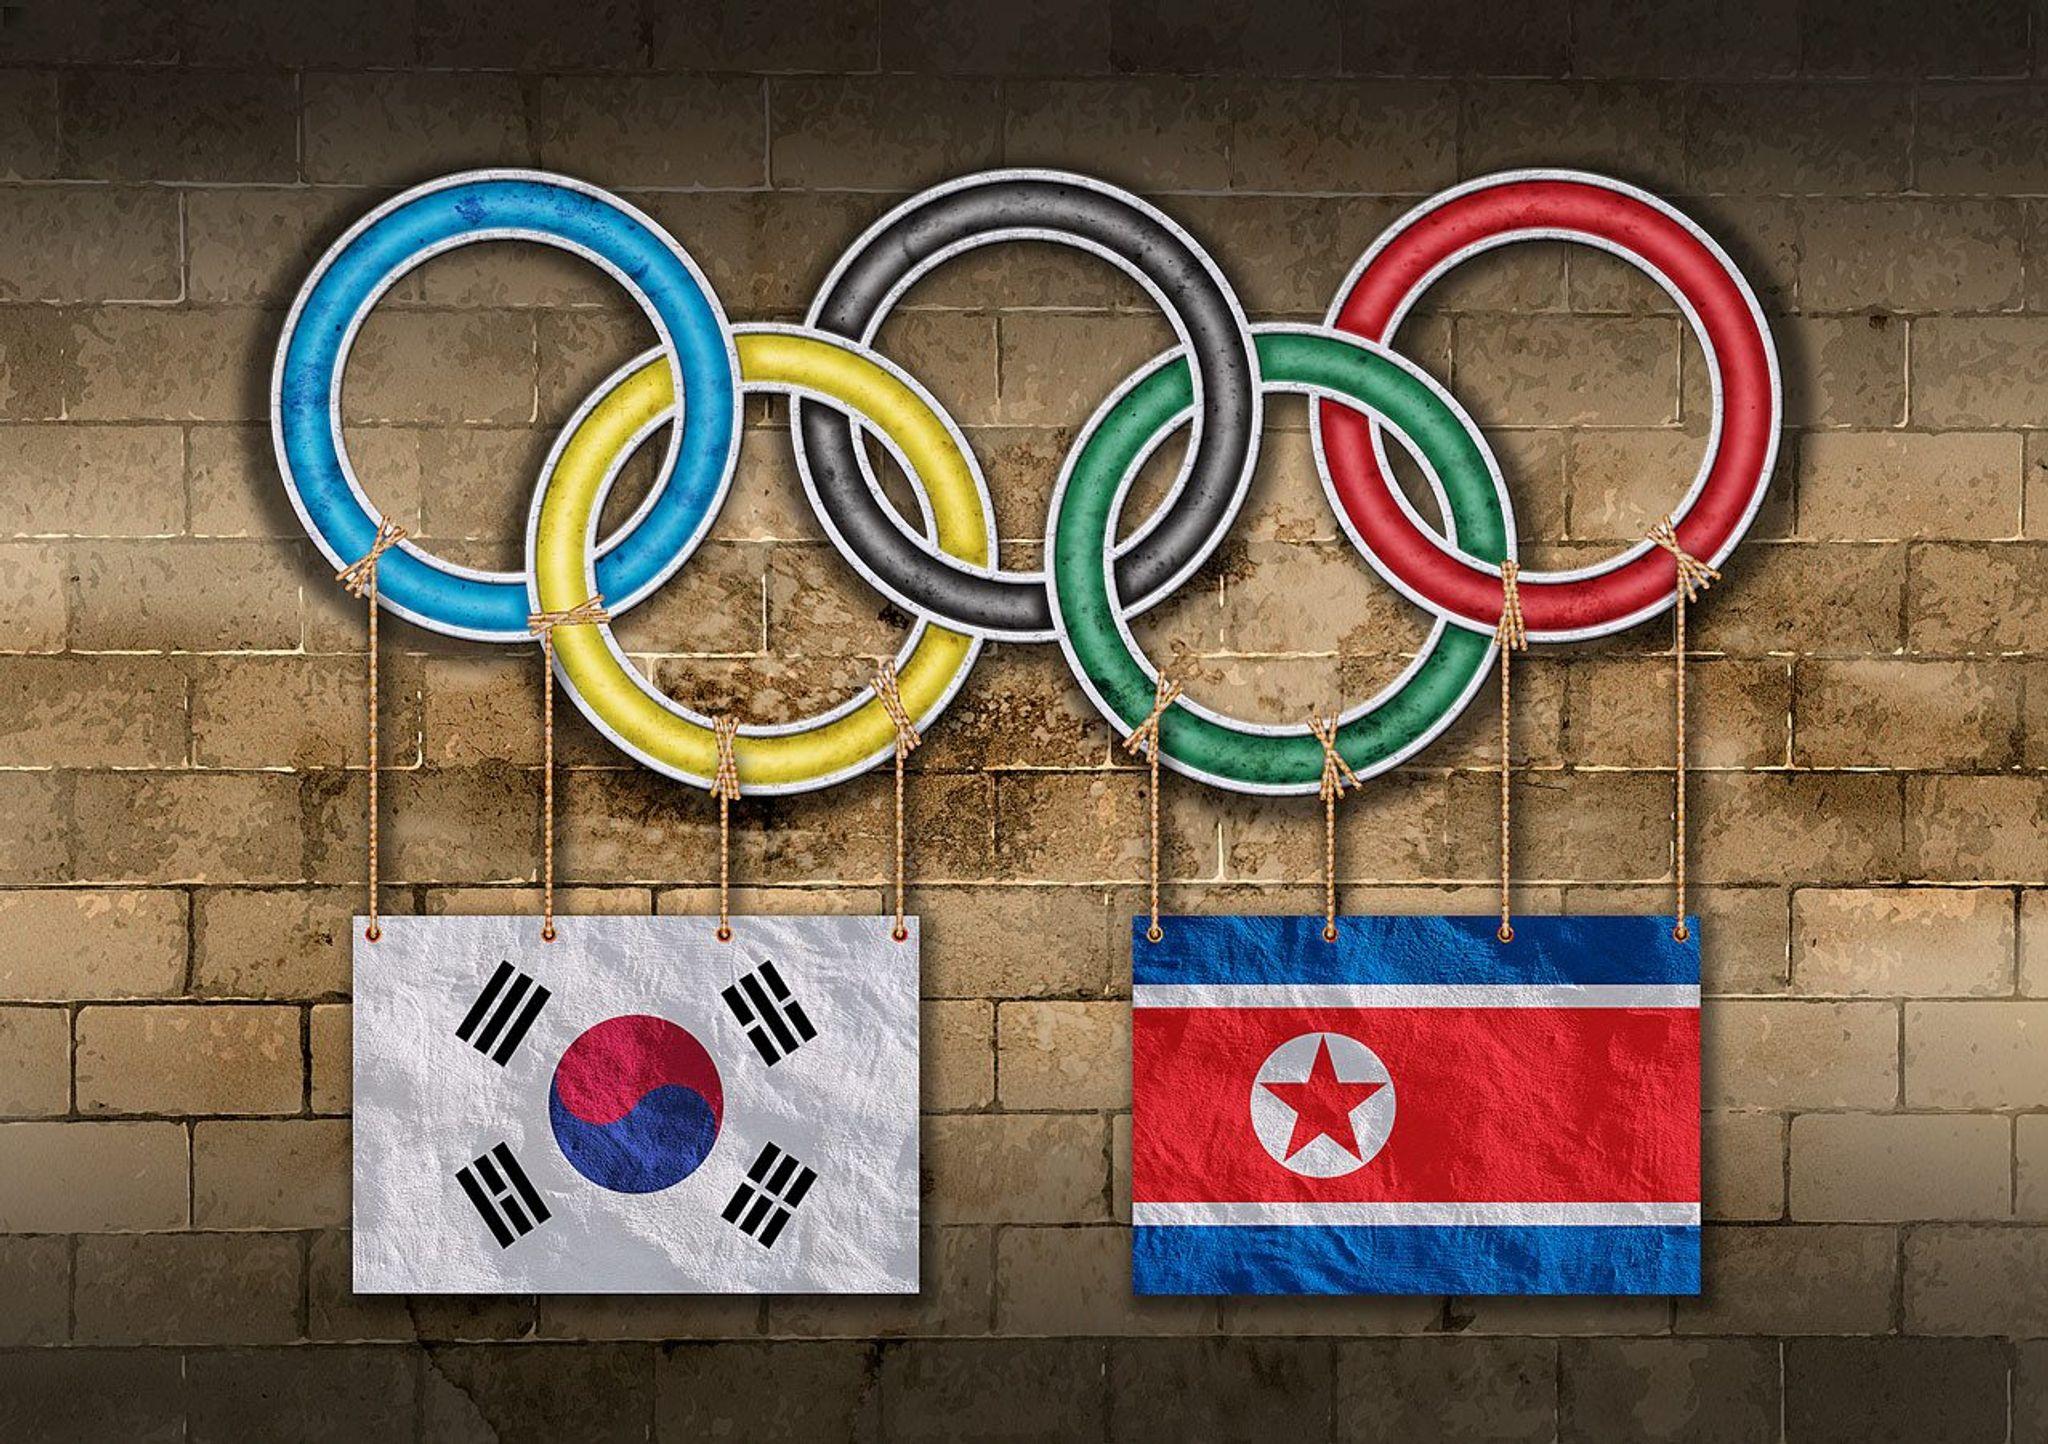 North korea may want to resume negotiations after the winter north korea may want to resume negotiations after the winter olympics washington times buycottarizona Image collections